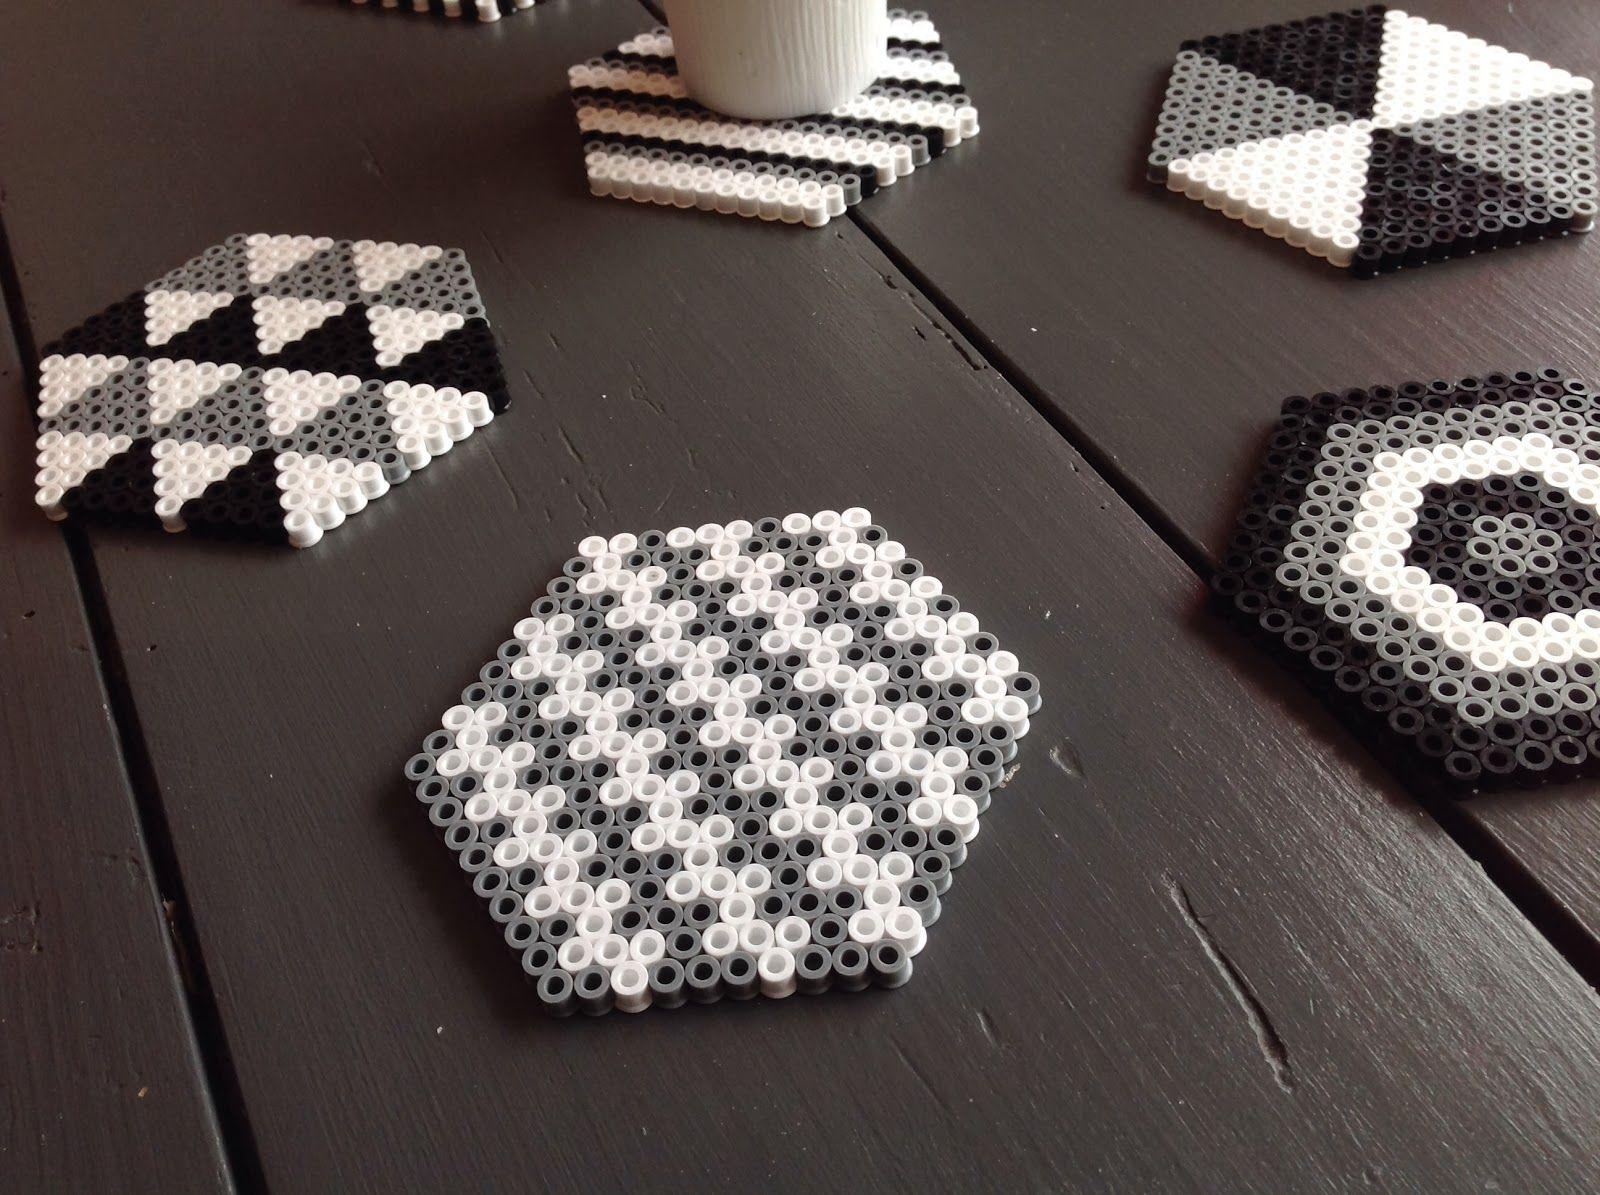 blog parenthese creative ln diy dessous de verre perles hama d co pinterest perles hama. Black Bedroom Furniture Sets. Home Design Ideas